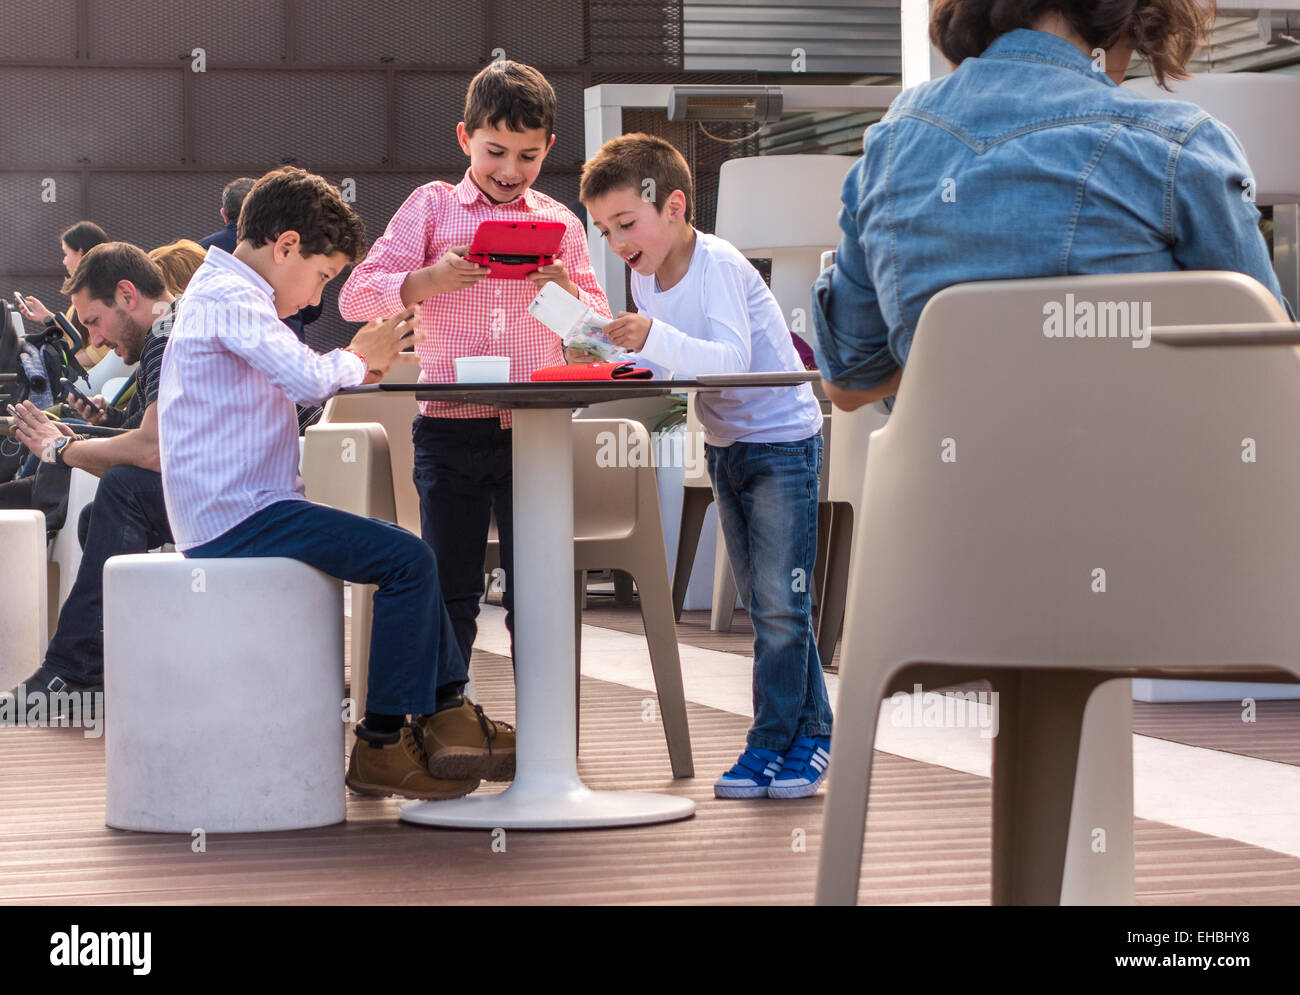 children-playing-handheld-computer-games